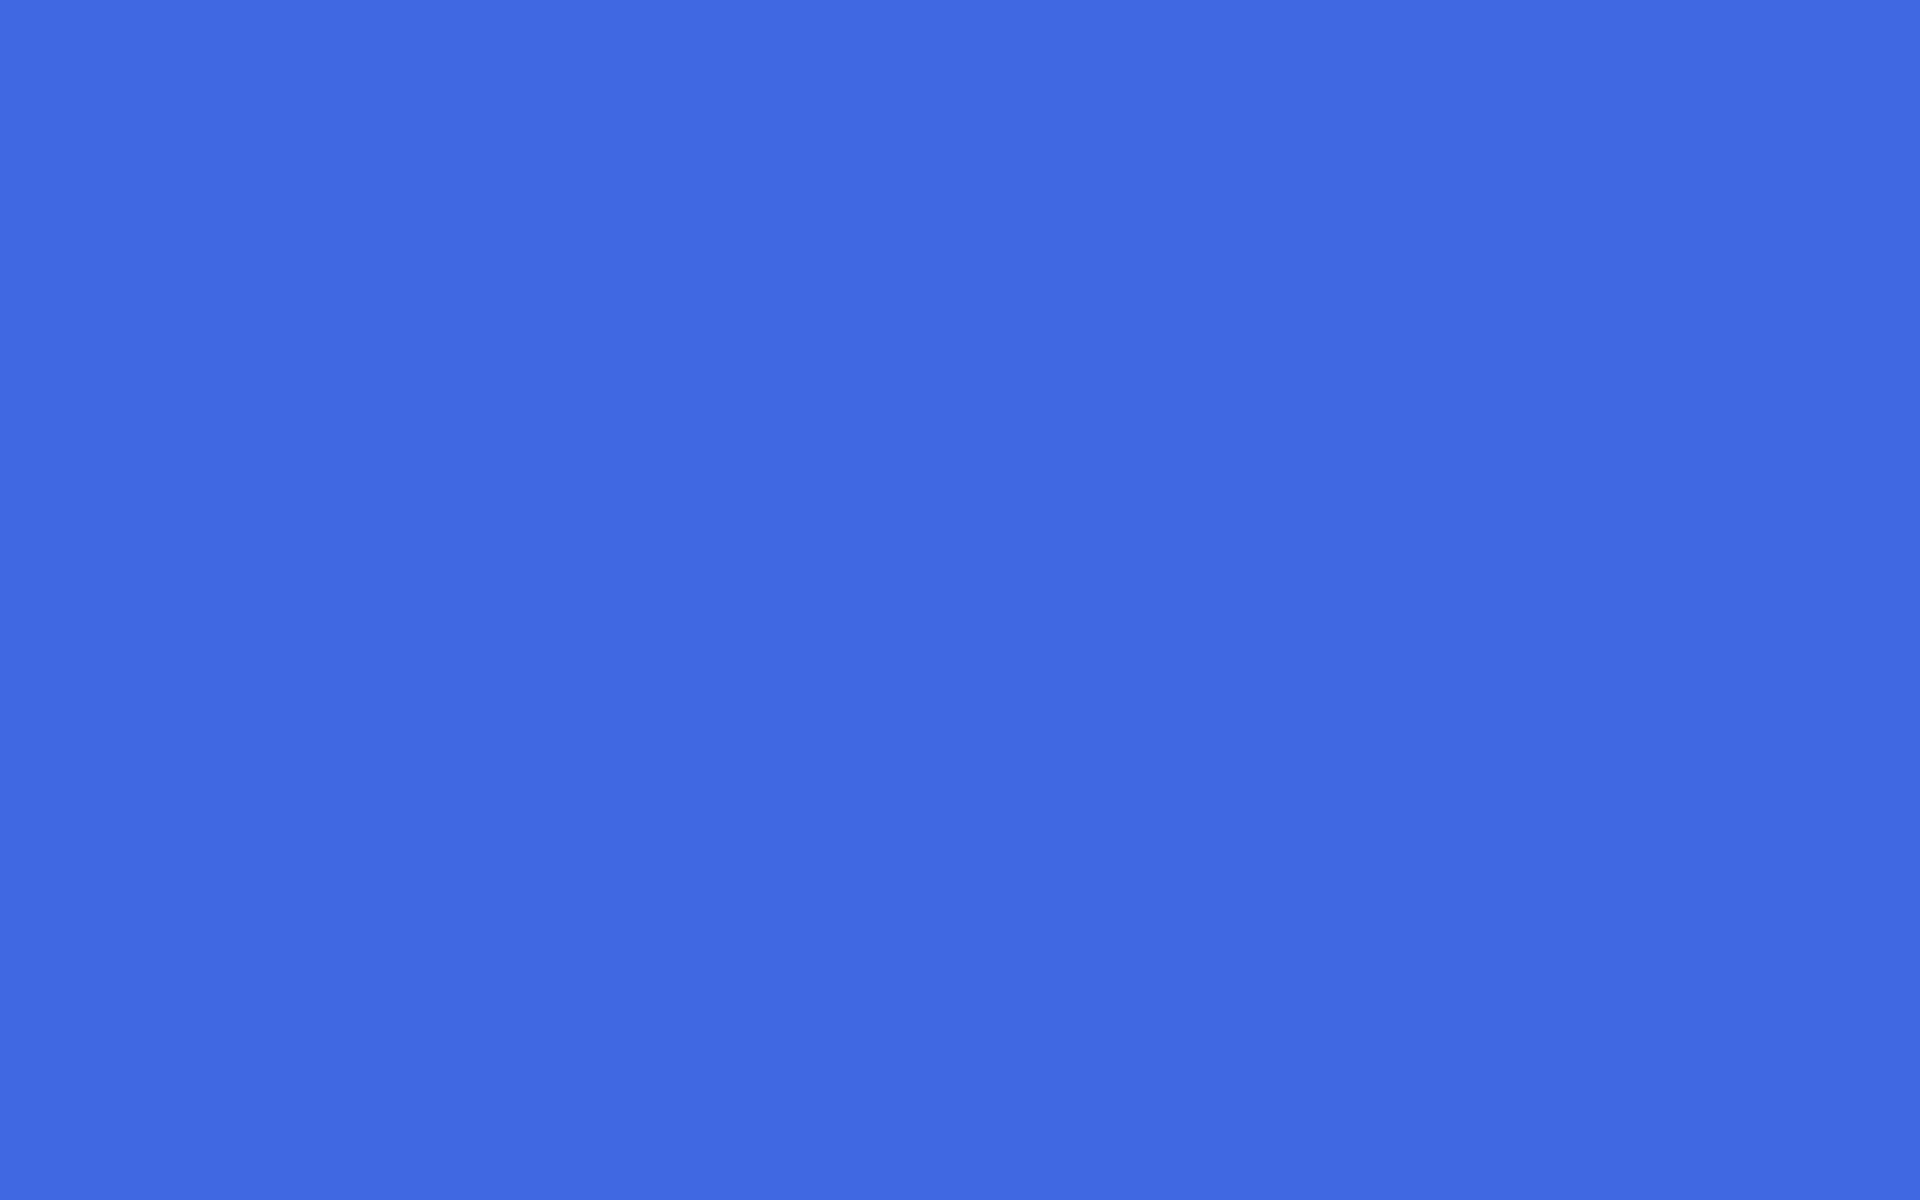 1920x1200 Royal Blue Web Solid Color Background